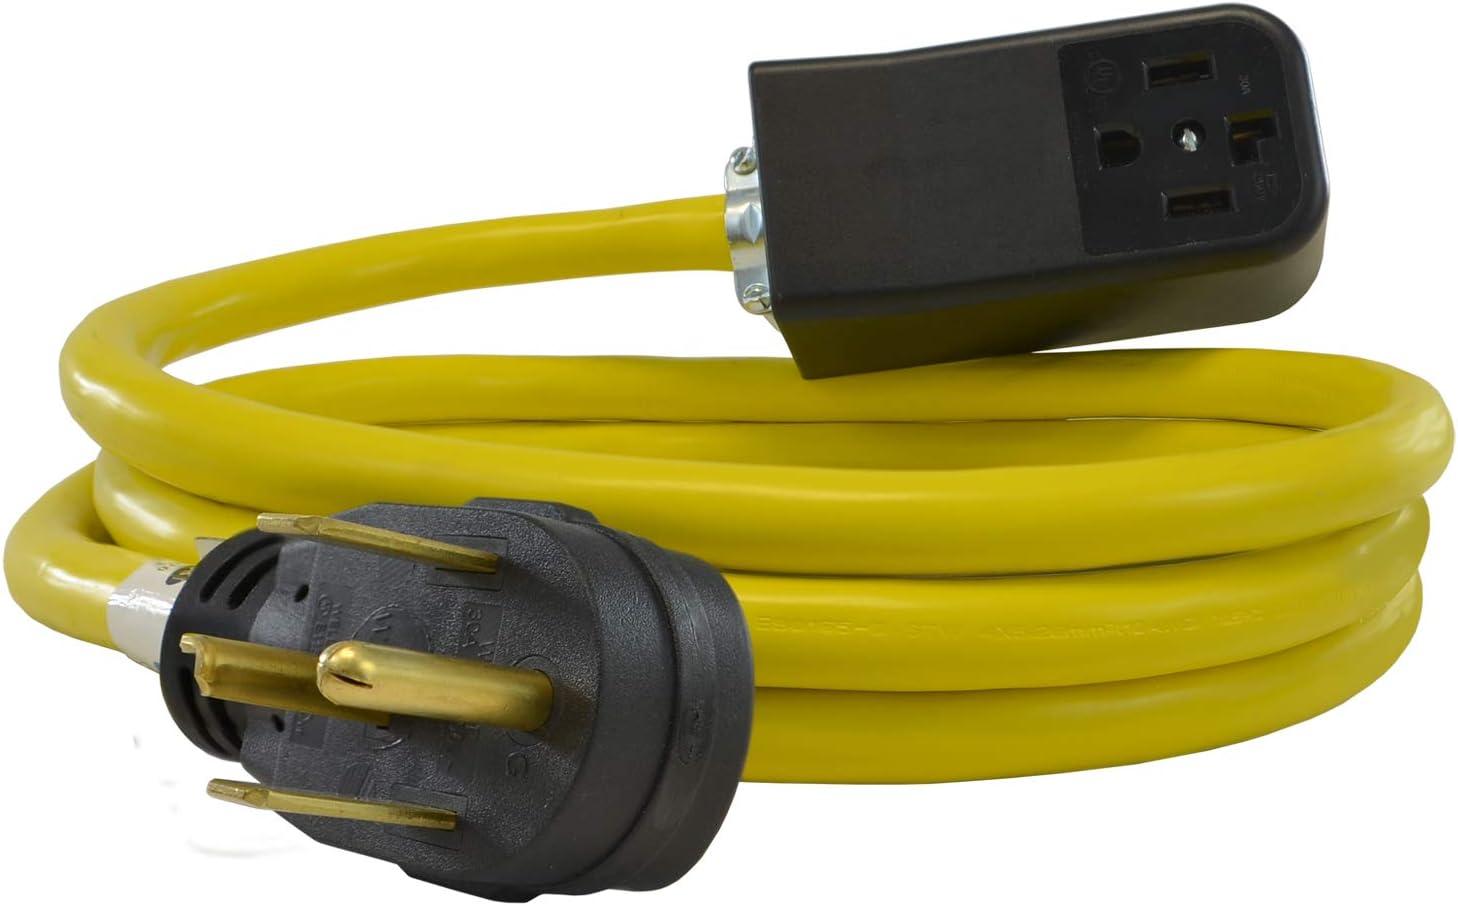 Conntek SB1430PR-025 NEMA 14-30P Heavy Max 46% Indefinitely OFF 25-F Duty Extension Cord